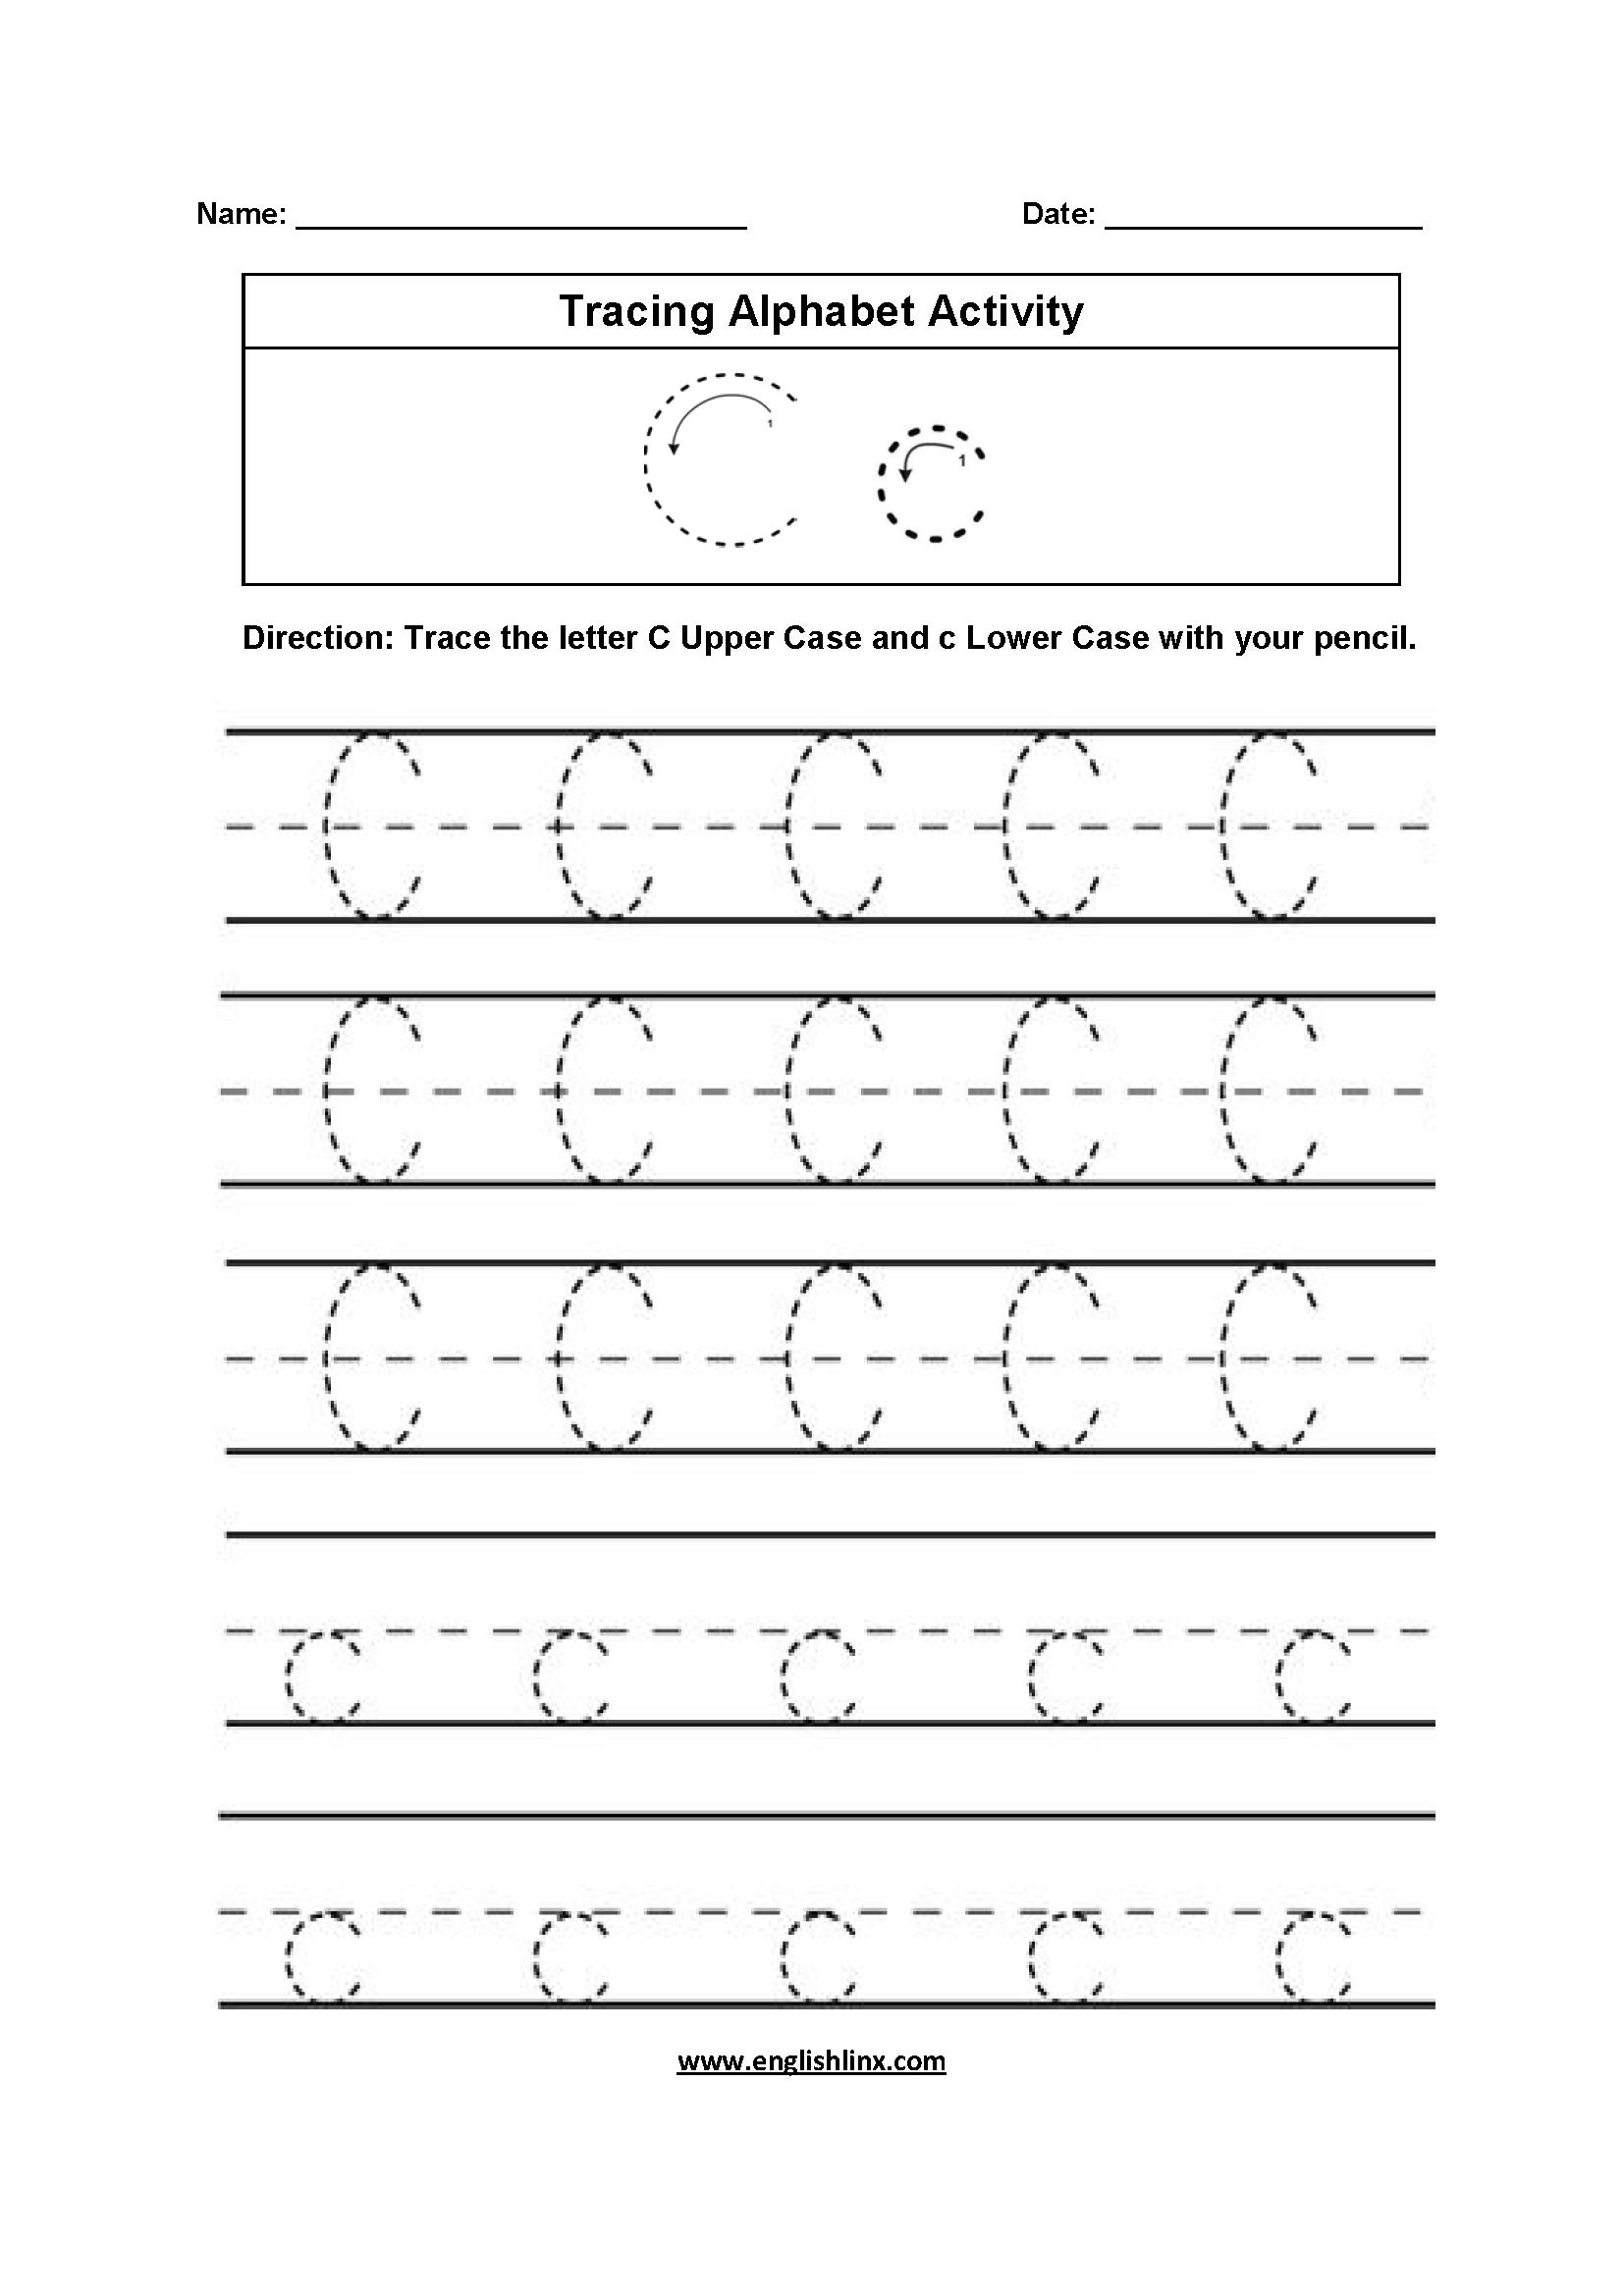 Alphabet Worksheets | Tracing Alphabet Worksheets regarding Tracing Letters A Worksheets